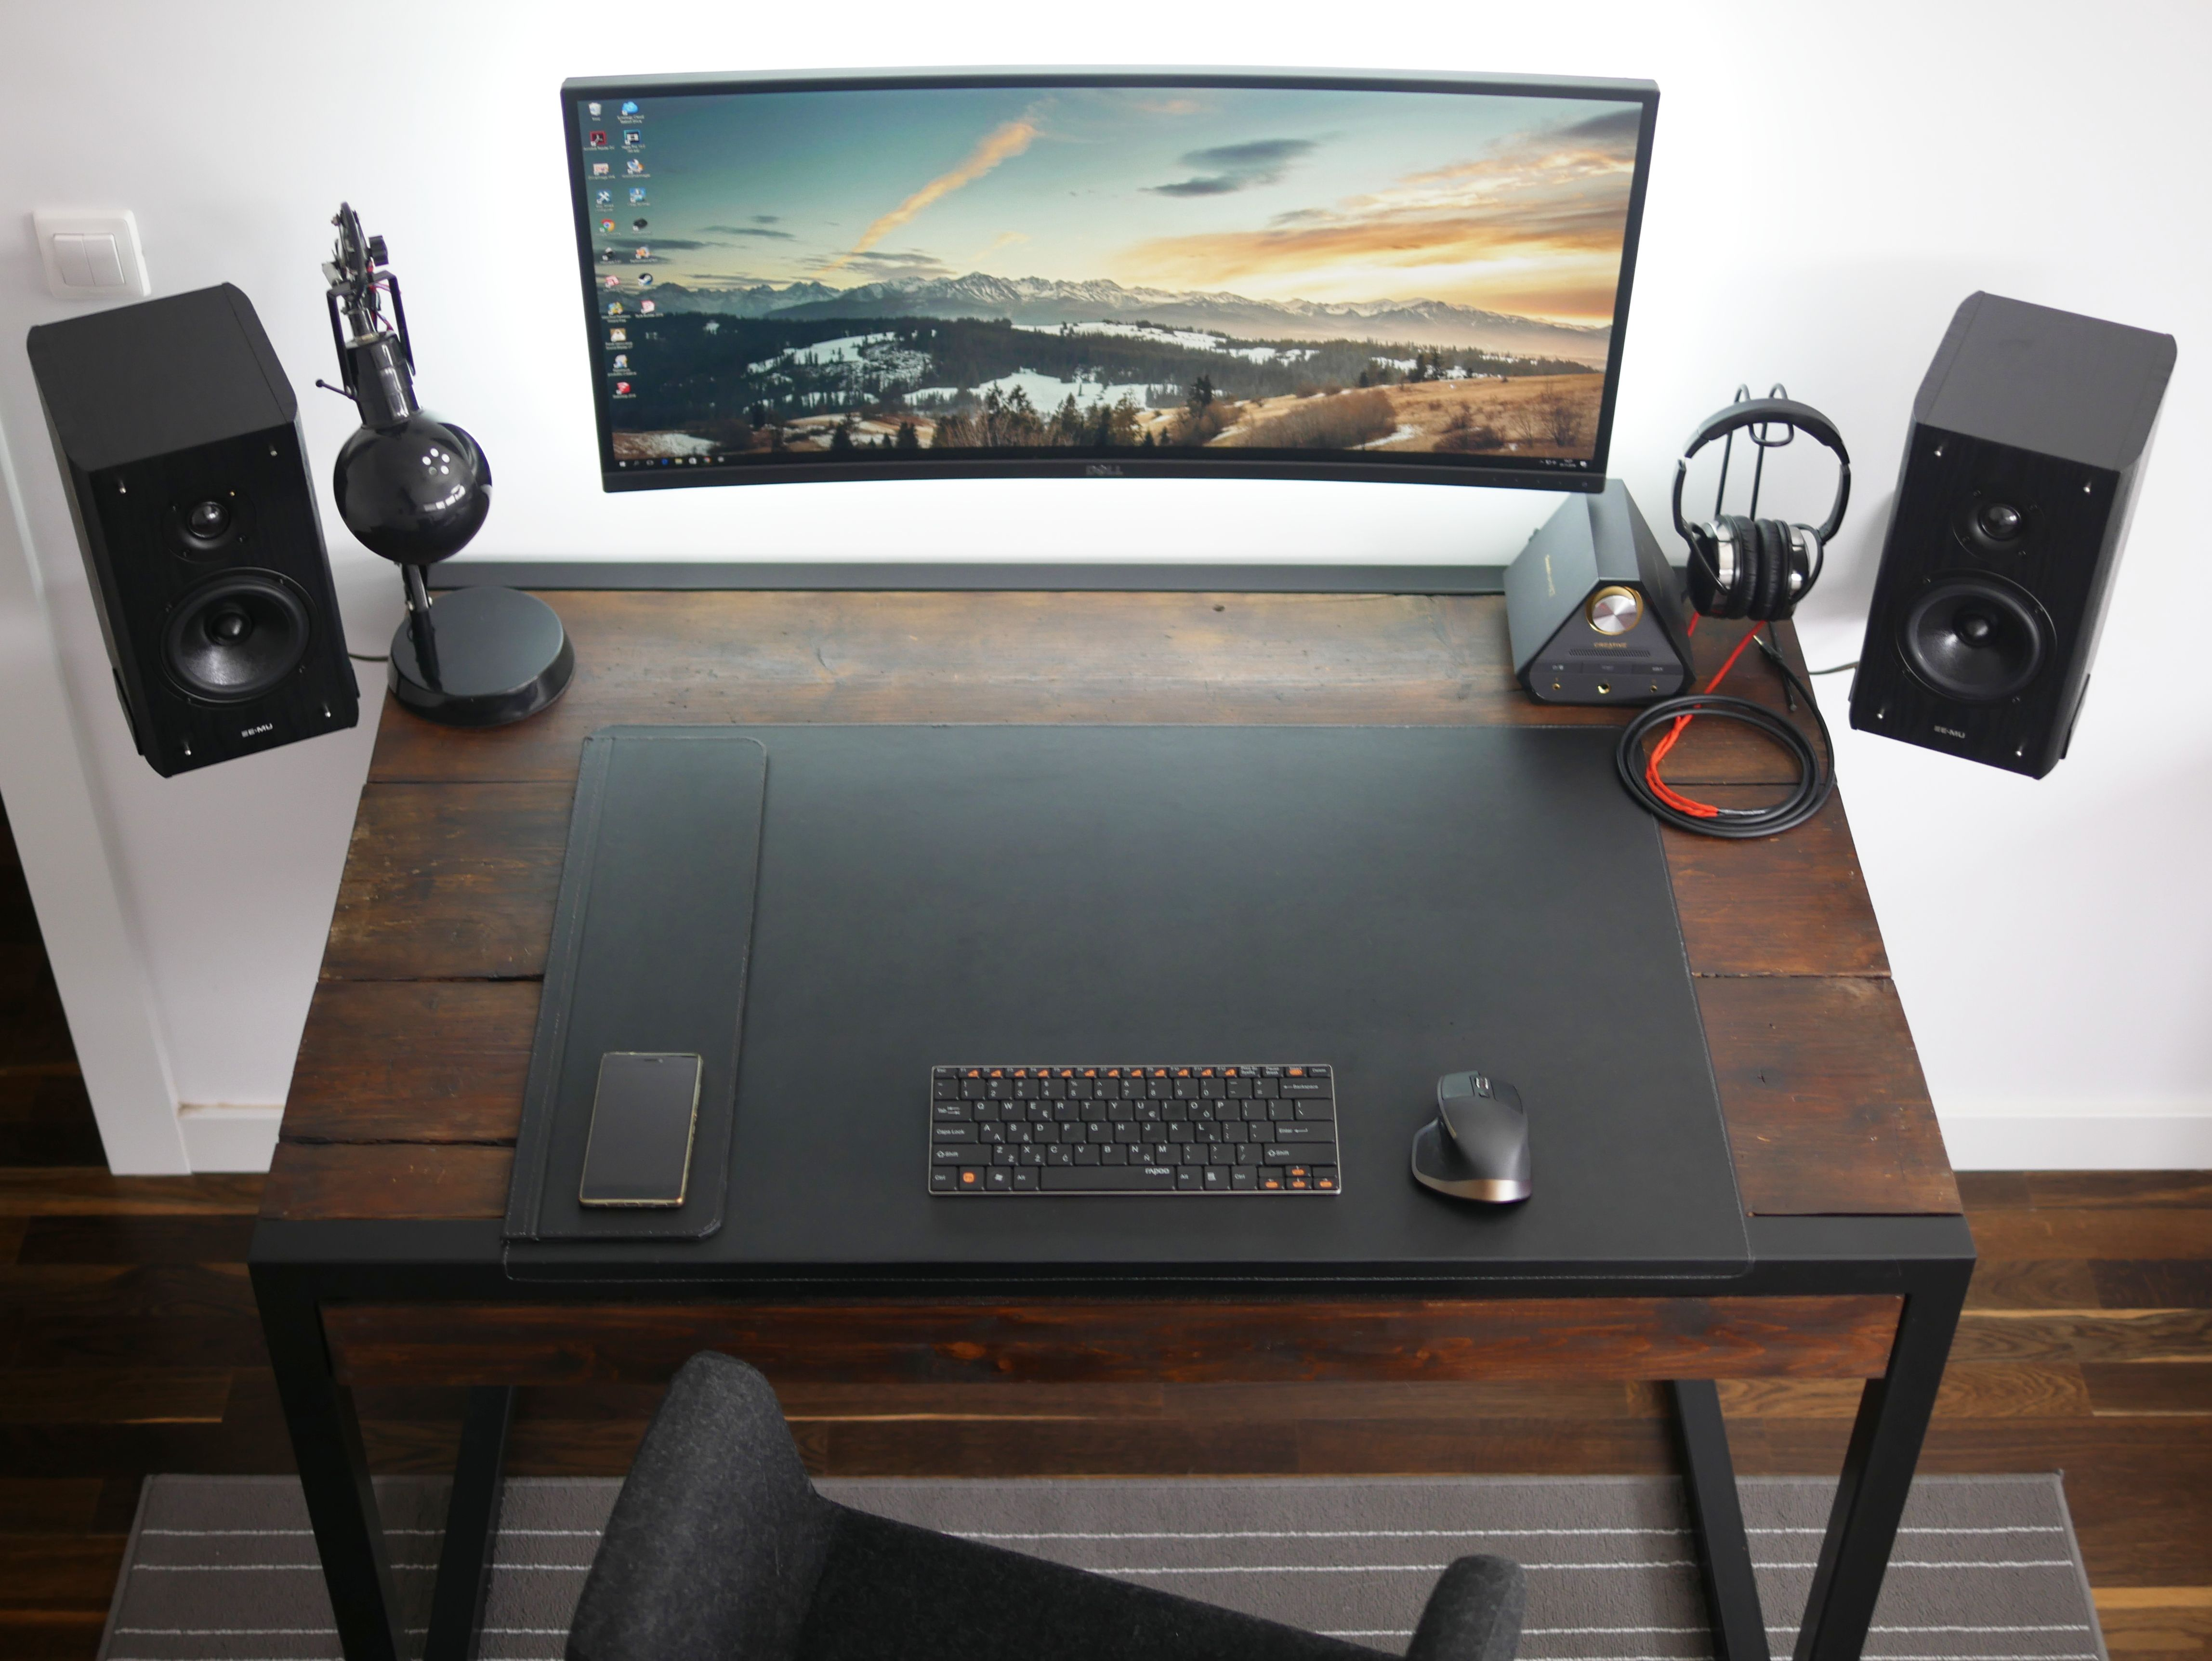 The Minimal Floating Monitor Workspace Computer Desk Setup Work